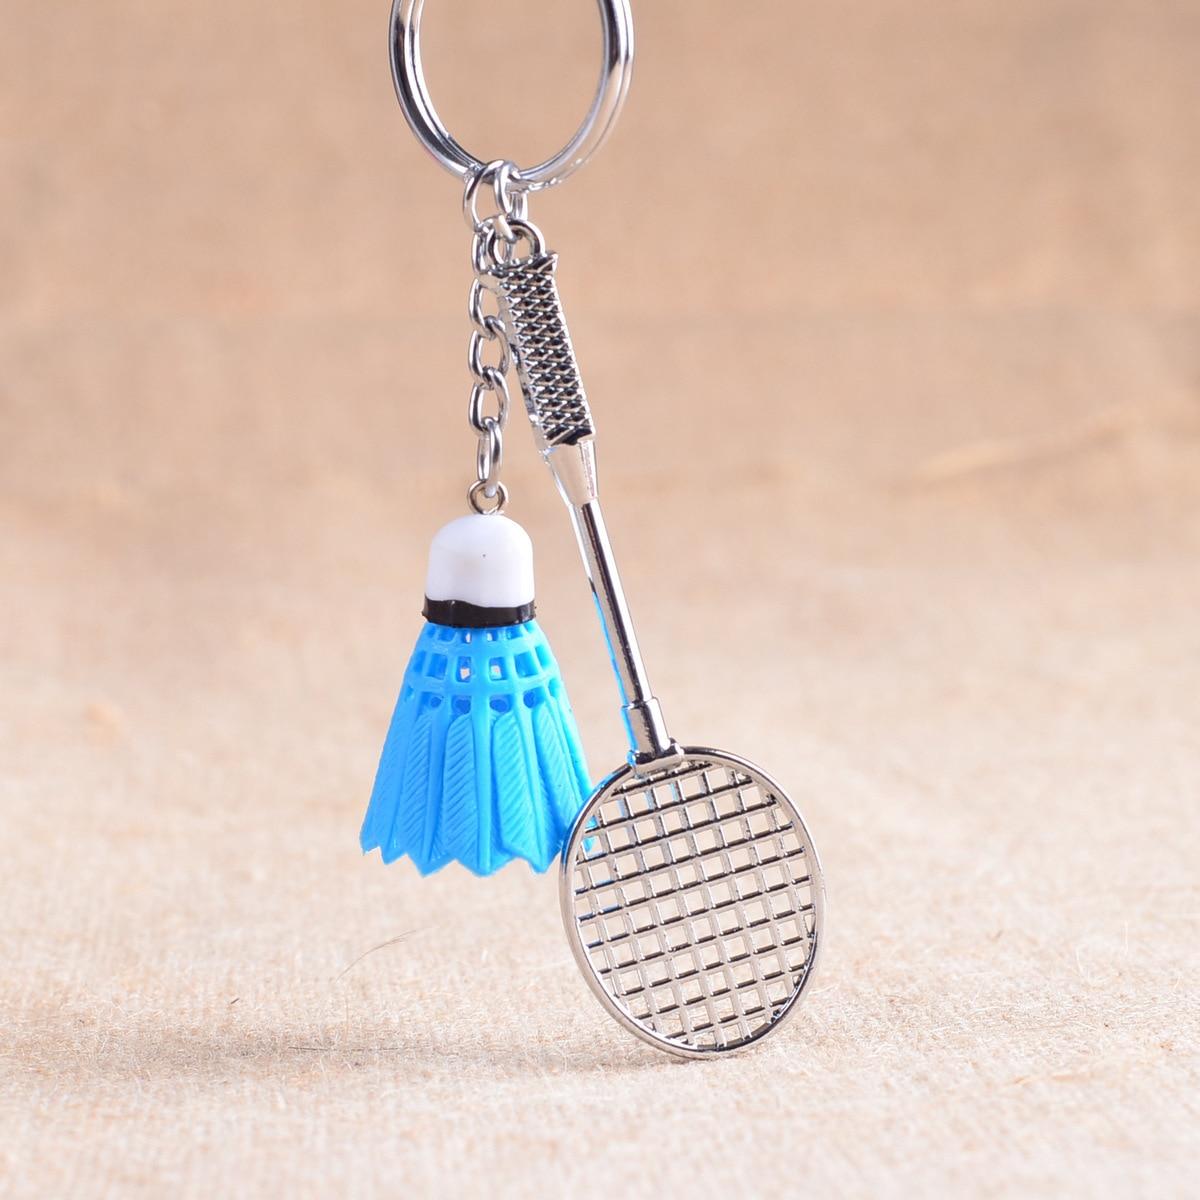 1 pc ZARSIA Mini Metal Badminton Racket Key Ring Souvenir Cute Badminton Racquet shuttlecock Key-chain Sports Chain Gift